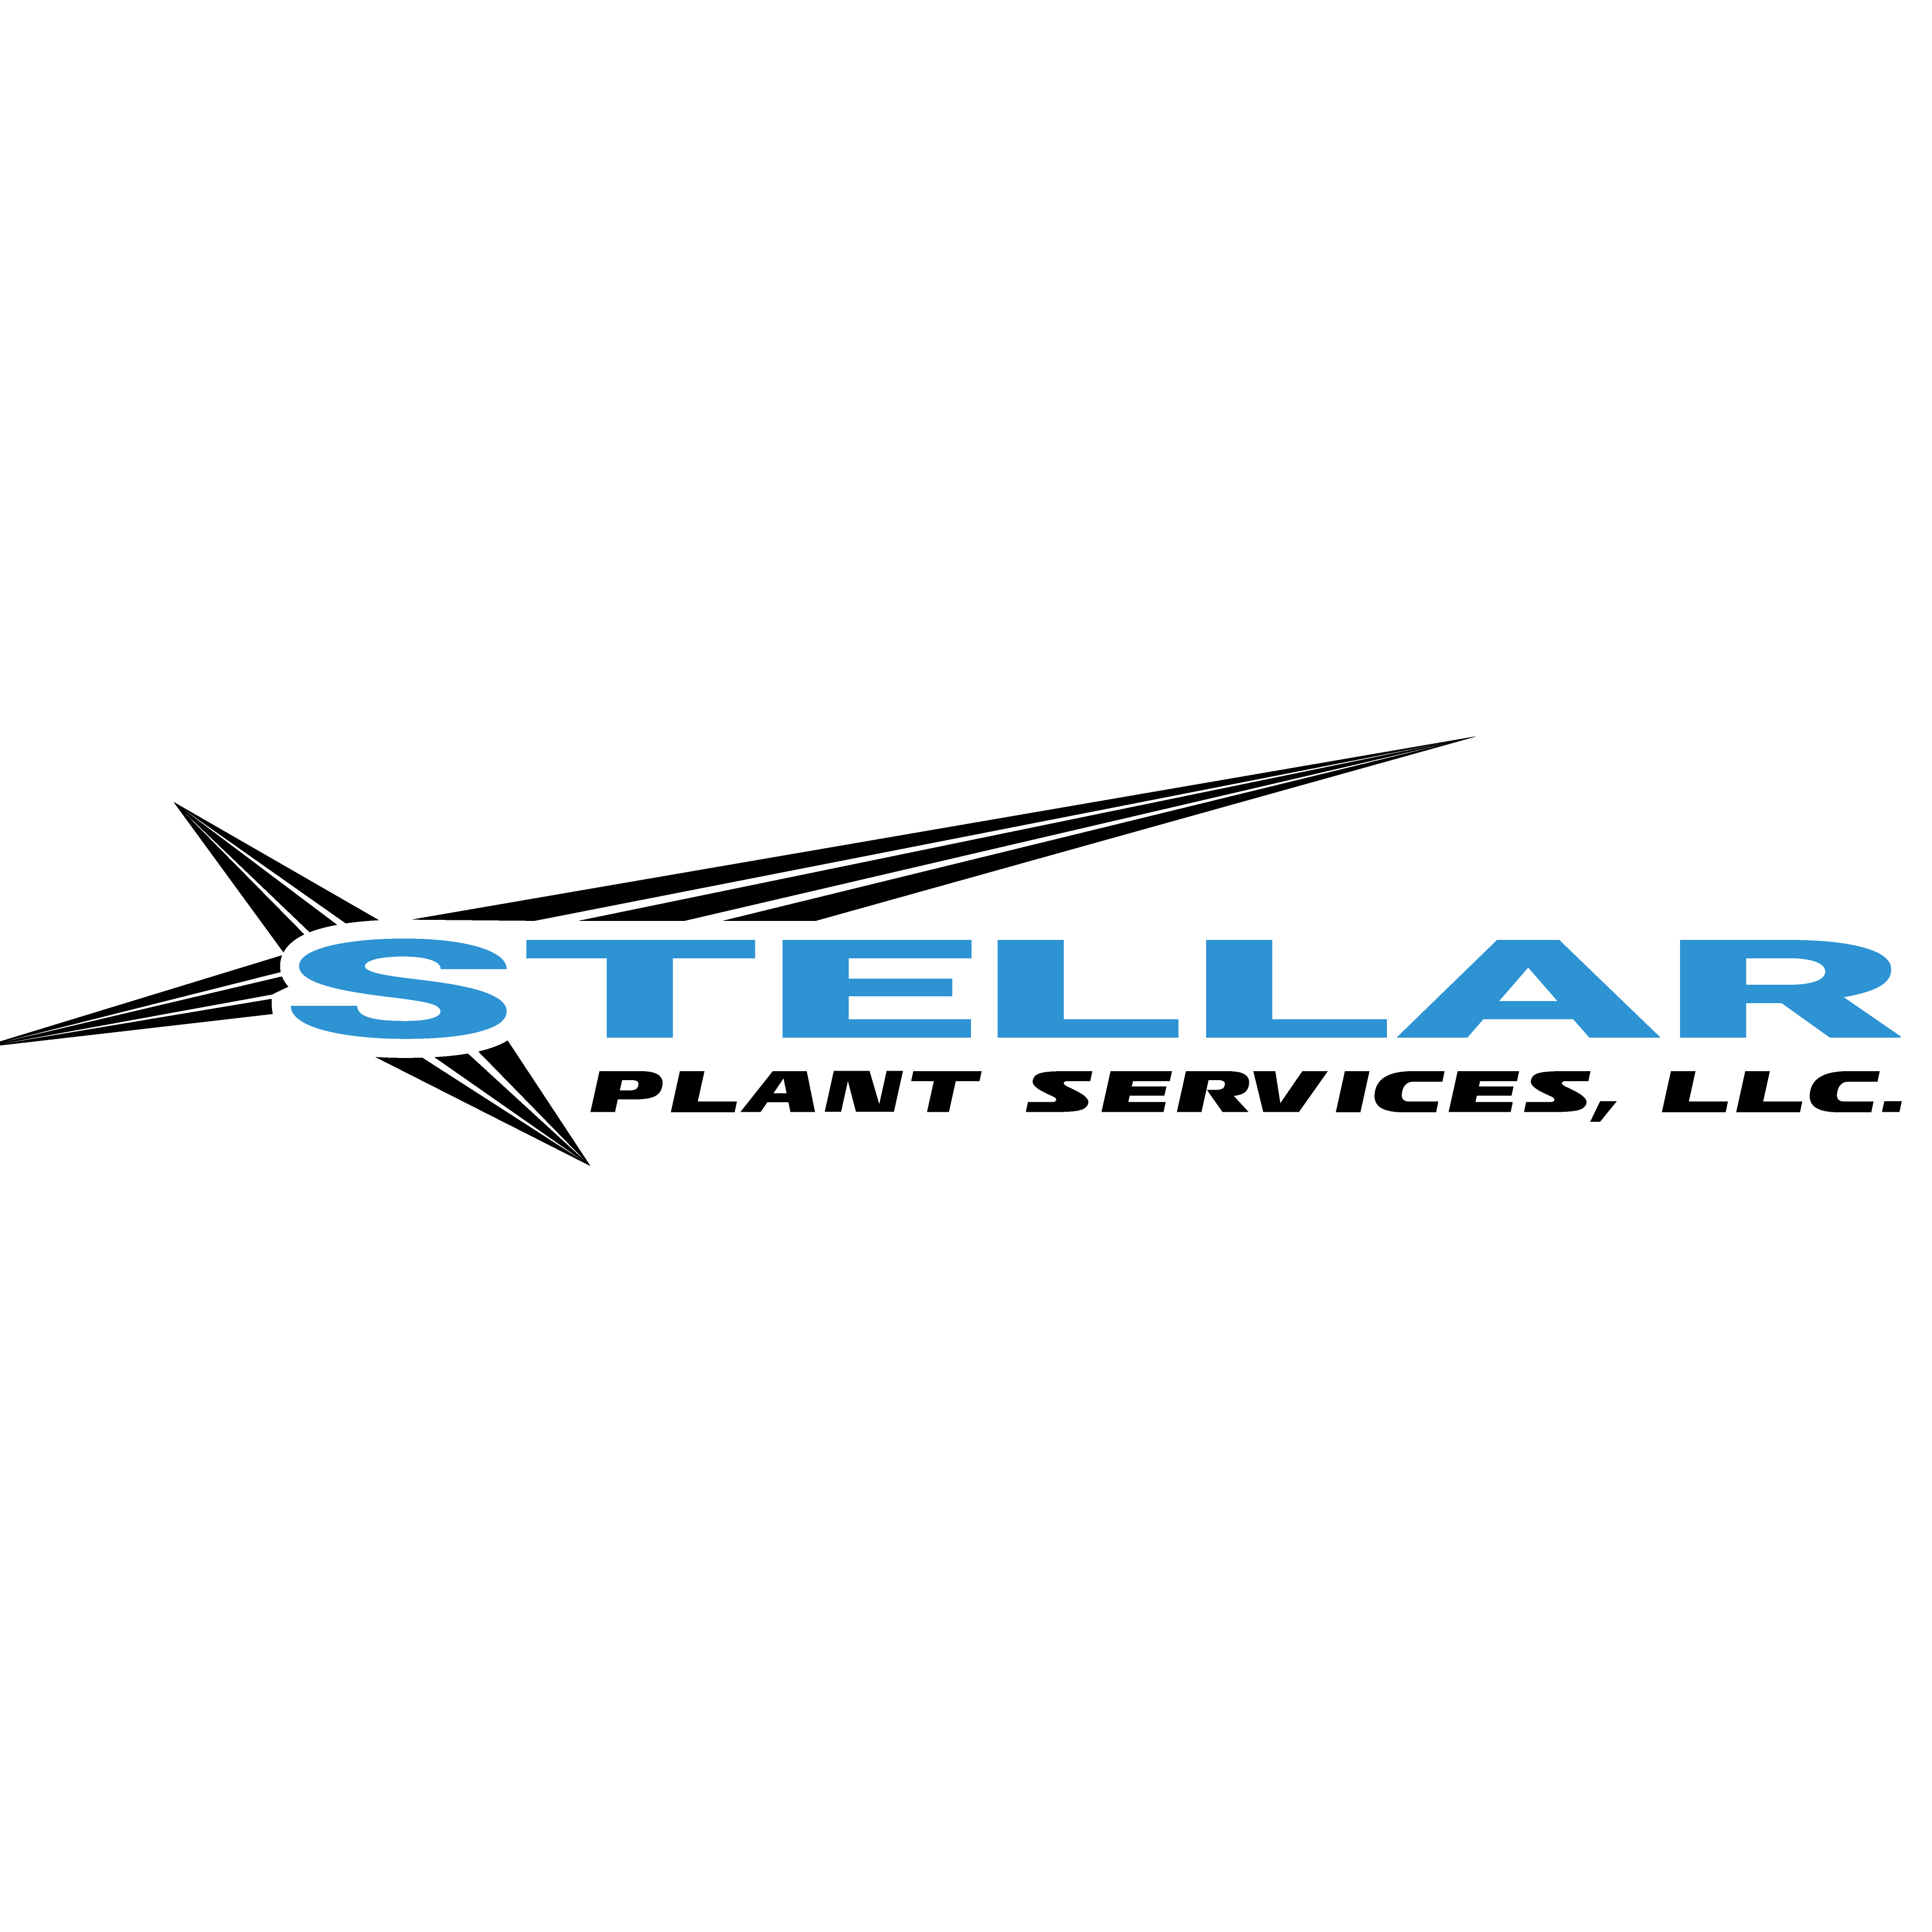 Stellar Plant Services, LLC.